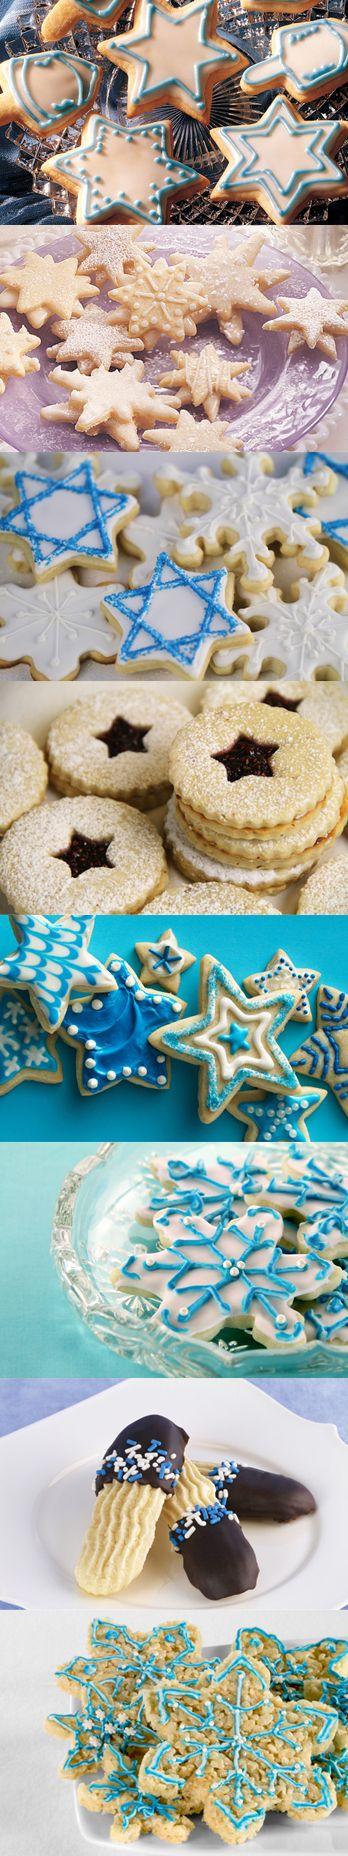 Hanukkah treats. #desserts #holiday